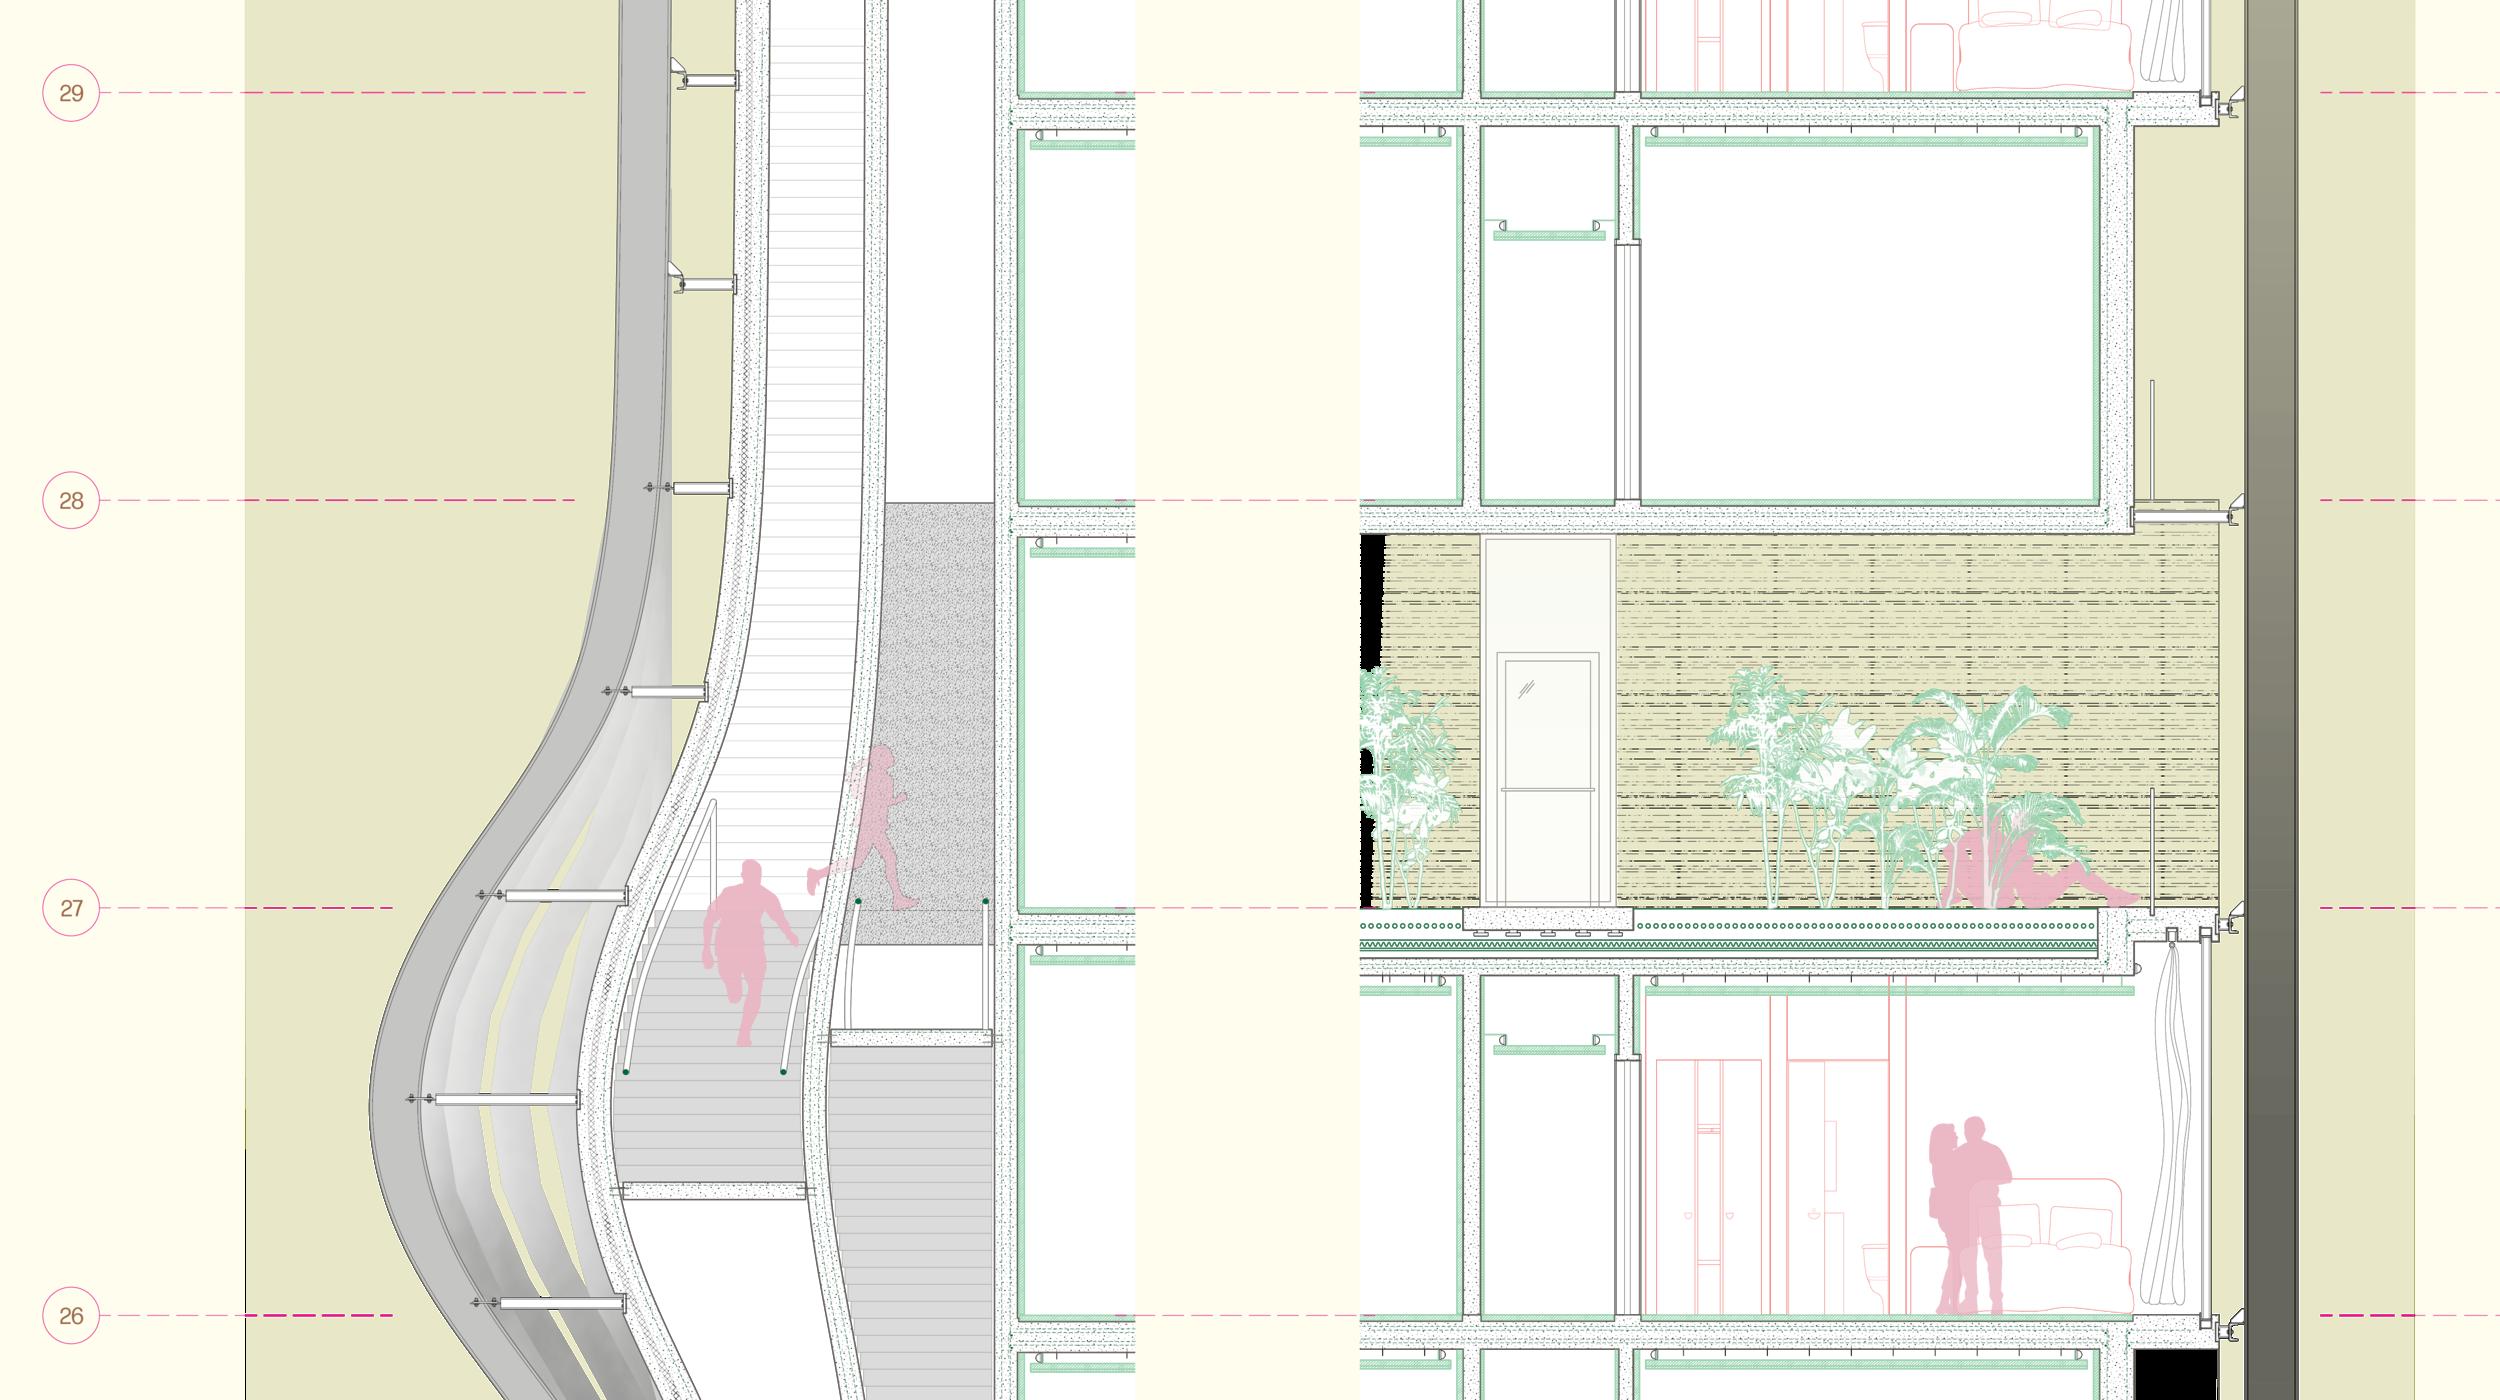 wallsection.jpg